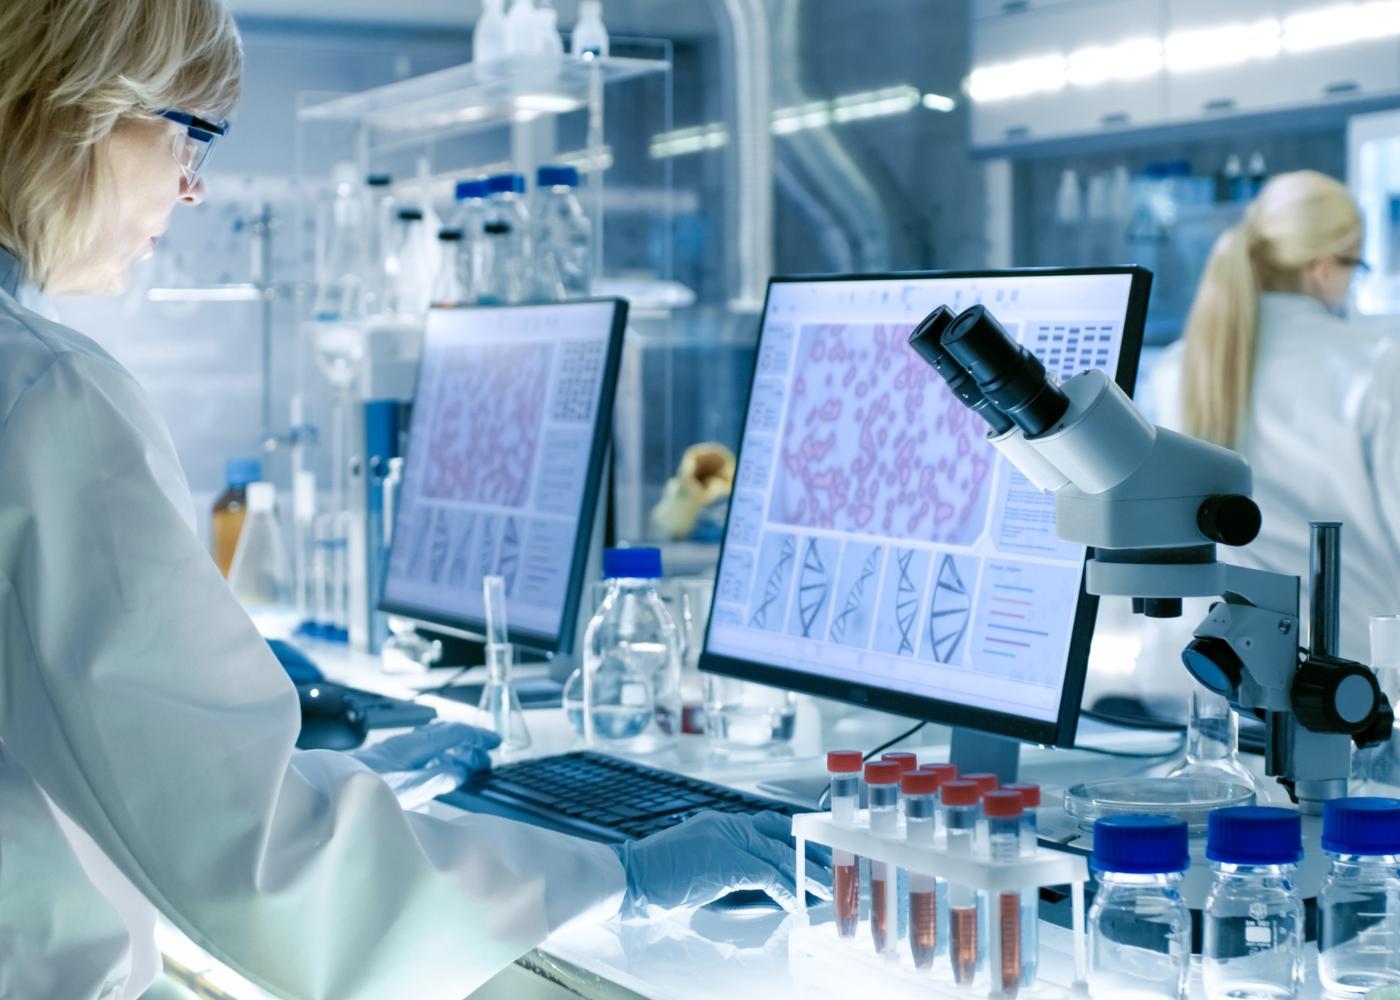 Cientistas a analisar vírus num laboratório